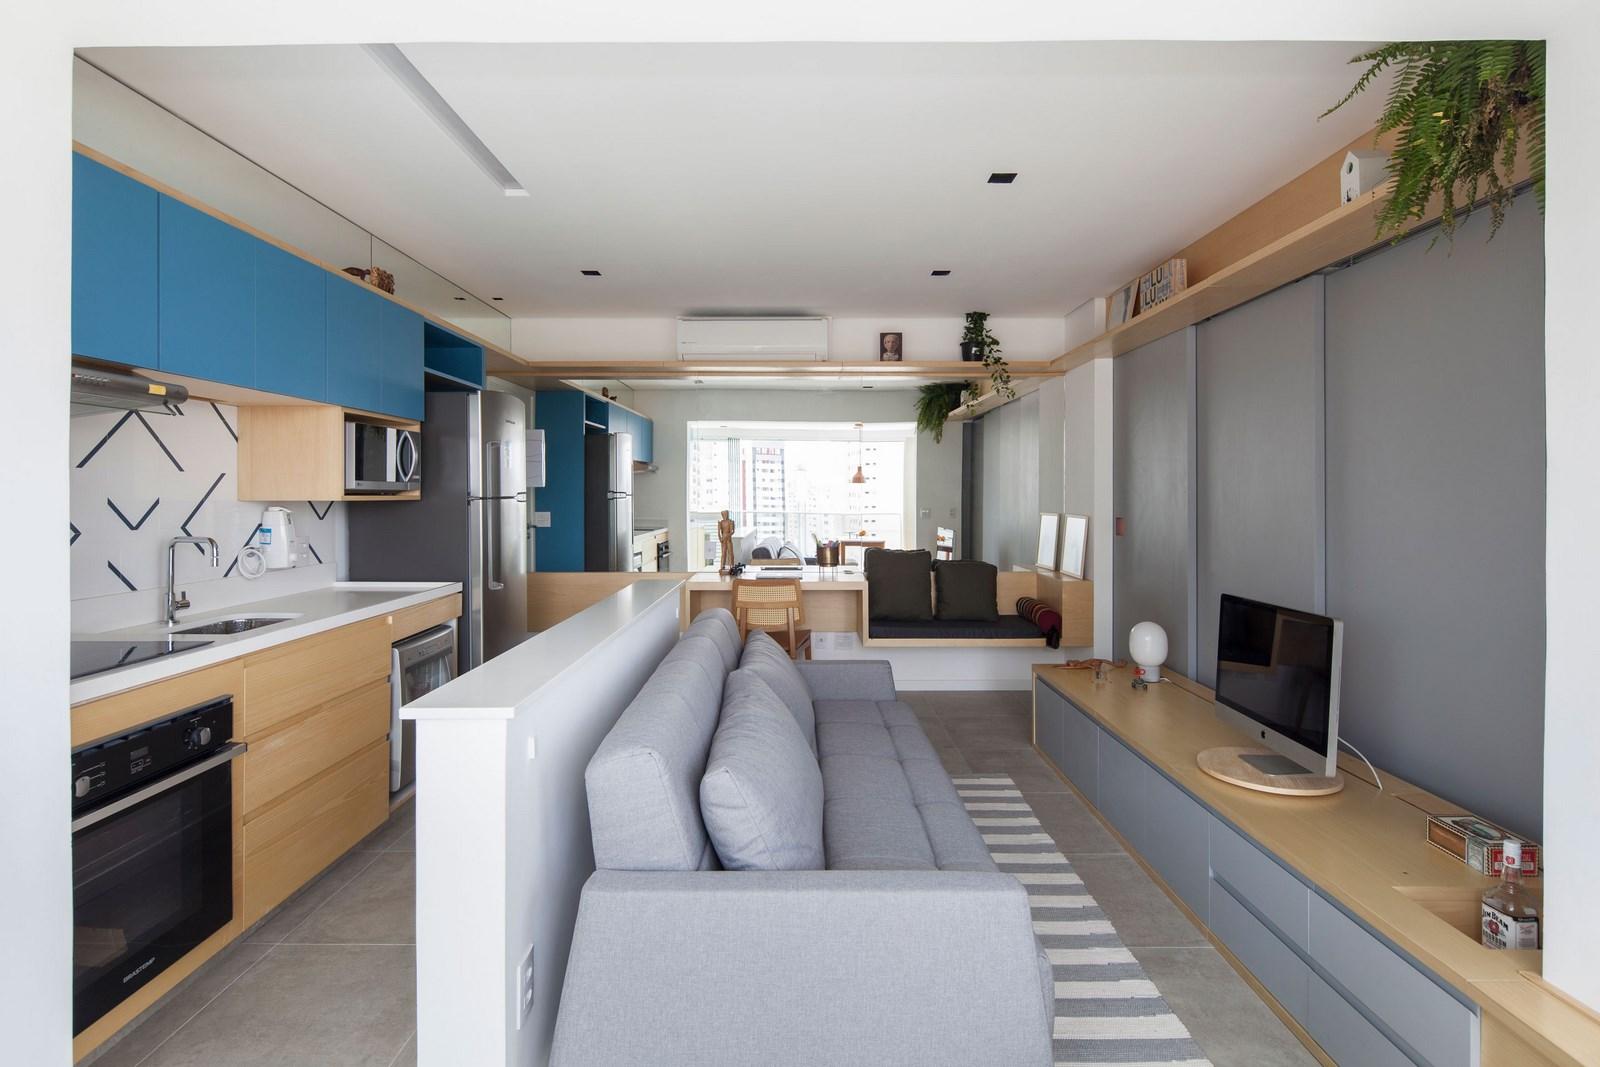 Apartamento Cazo _ Estúdio BRA (4) (Copy)